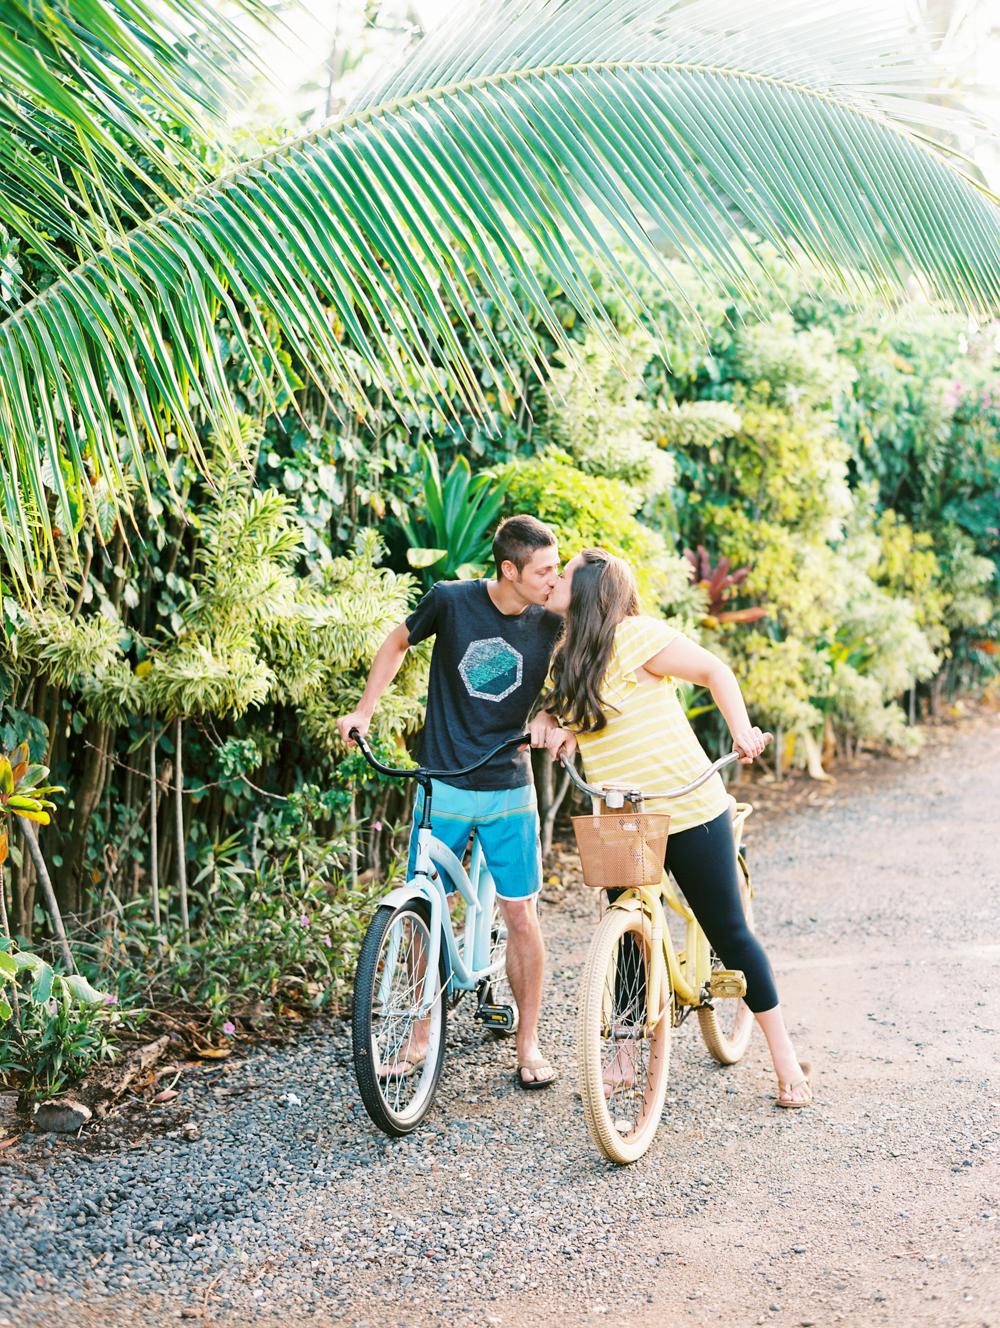 tacocat kauai couple photography love by hawaii photographer wendy laurel